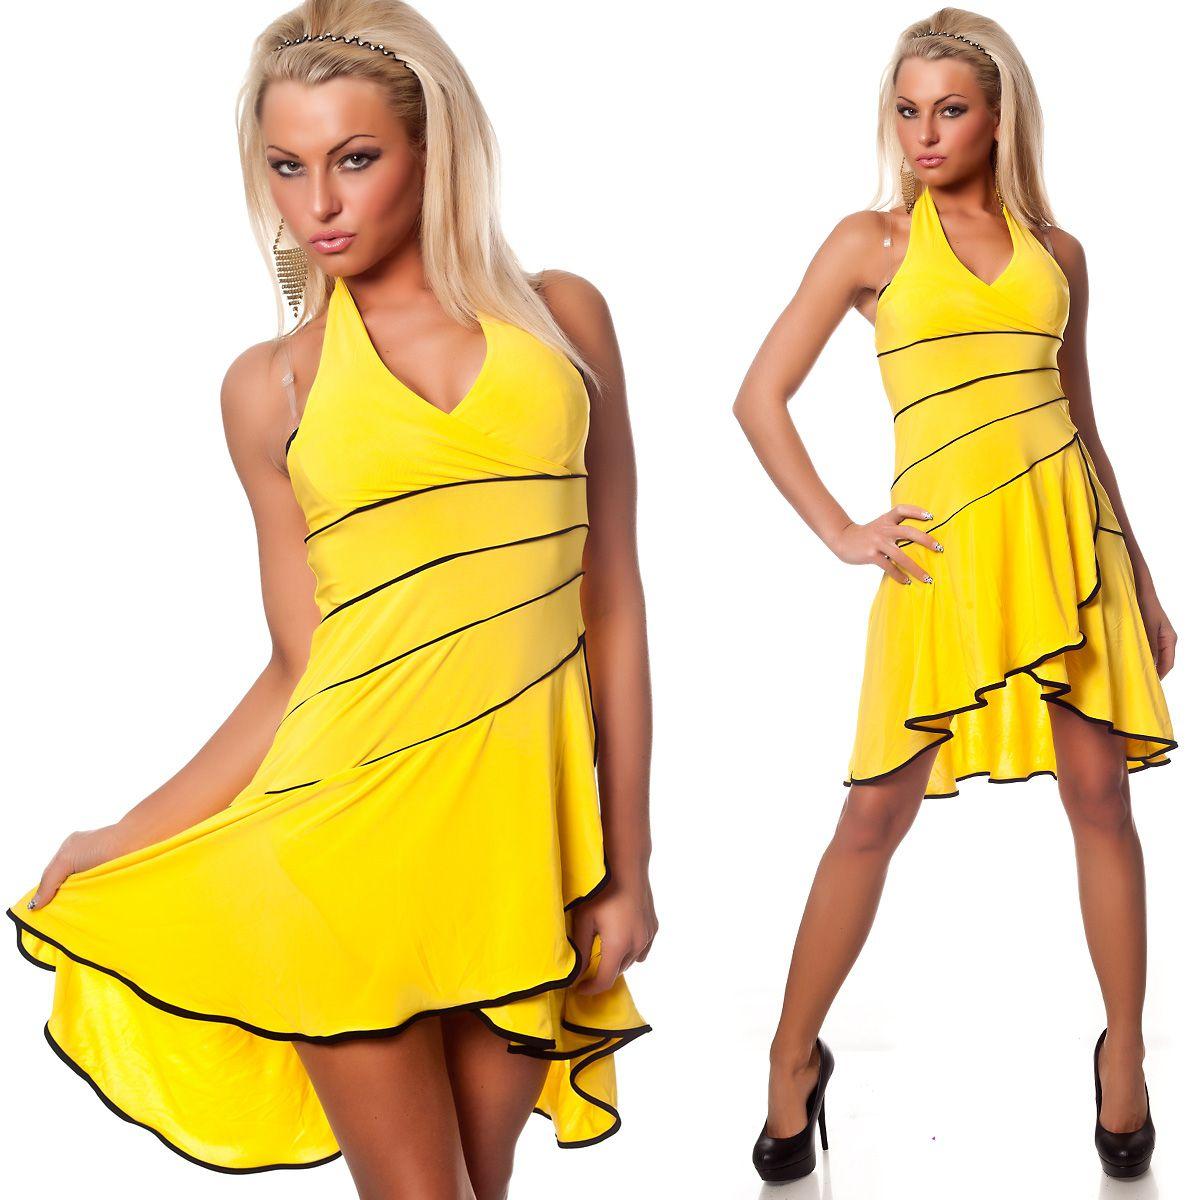 133aee144b Női nyári ruha latinos fodros csinos salsa ruha | divatplaza